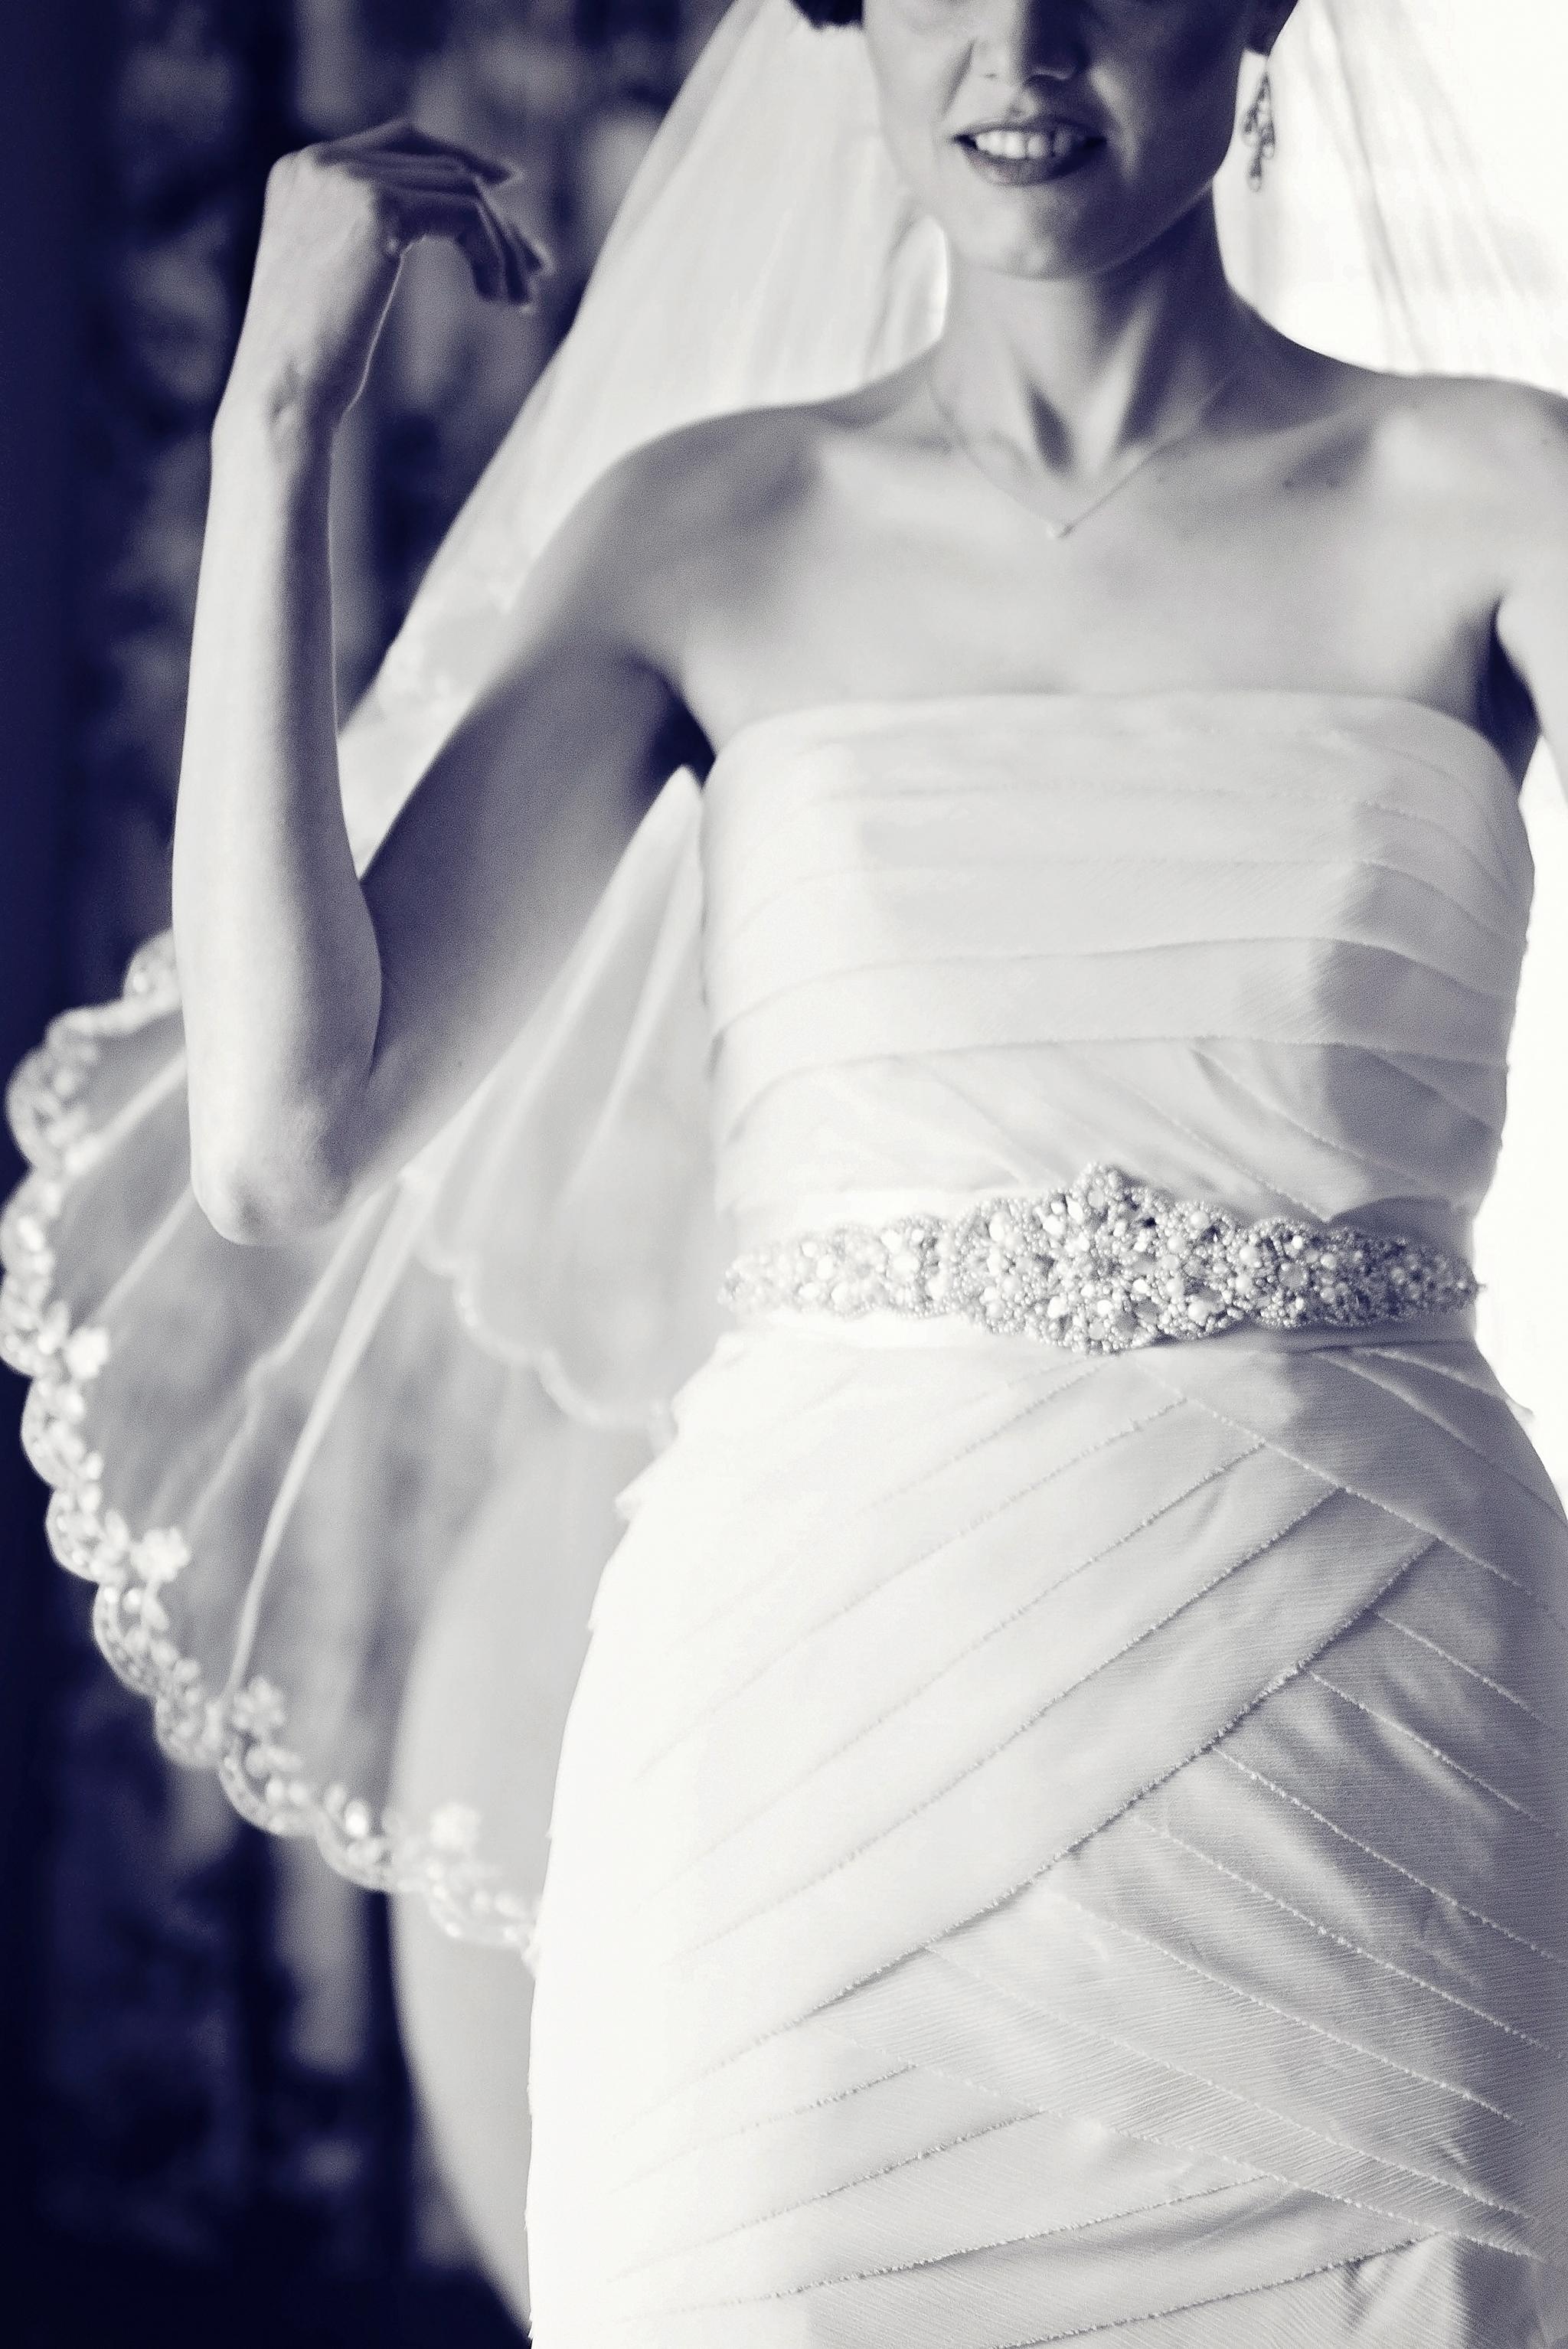 NJ-NY-wedding-photographer-120NJ-NY-wedding-photographer-120NJ-NY-WEDDING-PHOTOGRAPHER-120.JPG